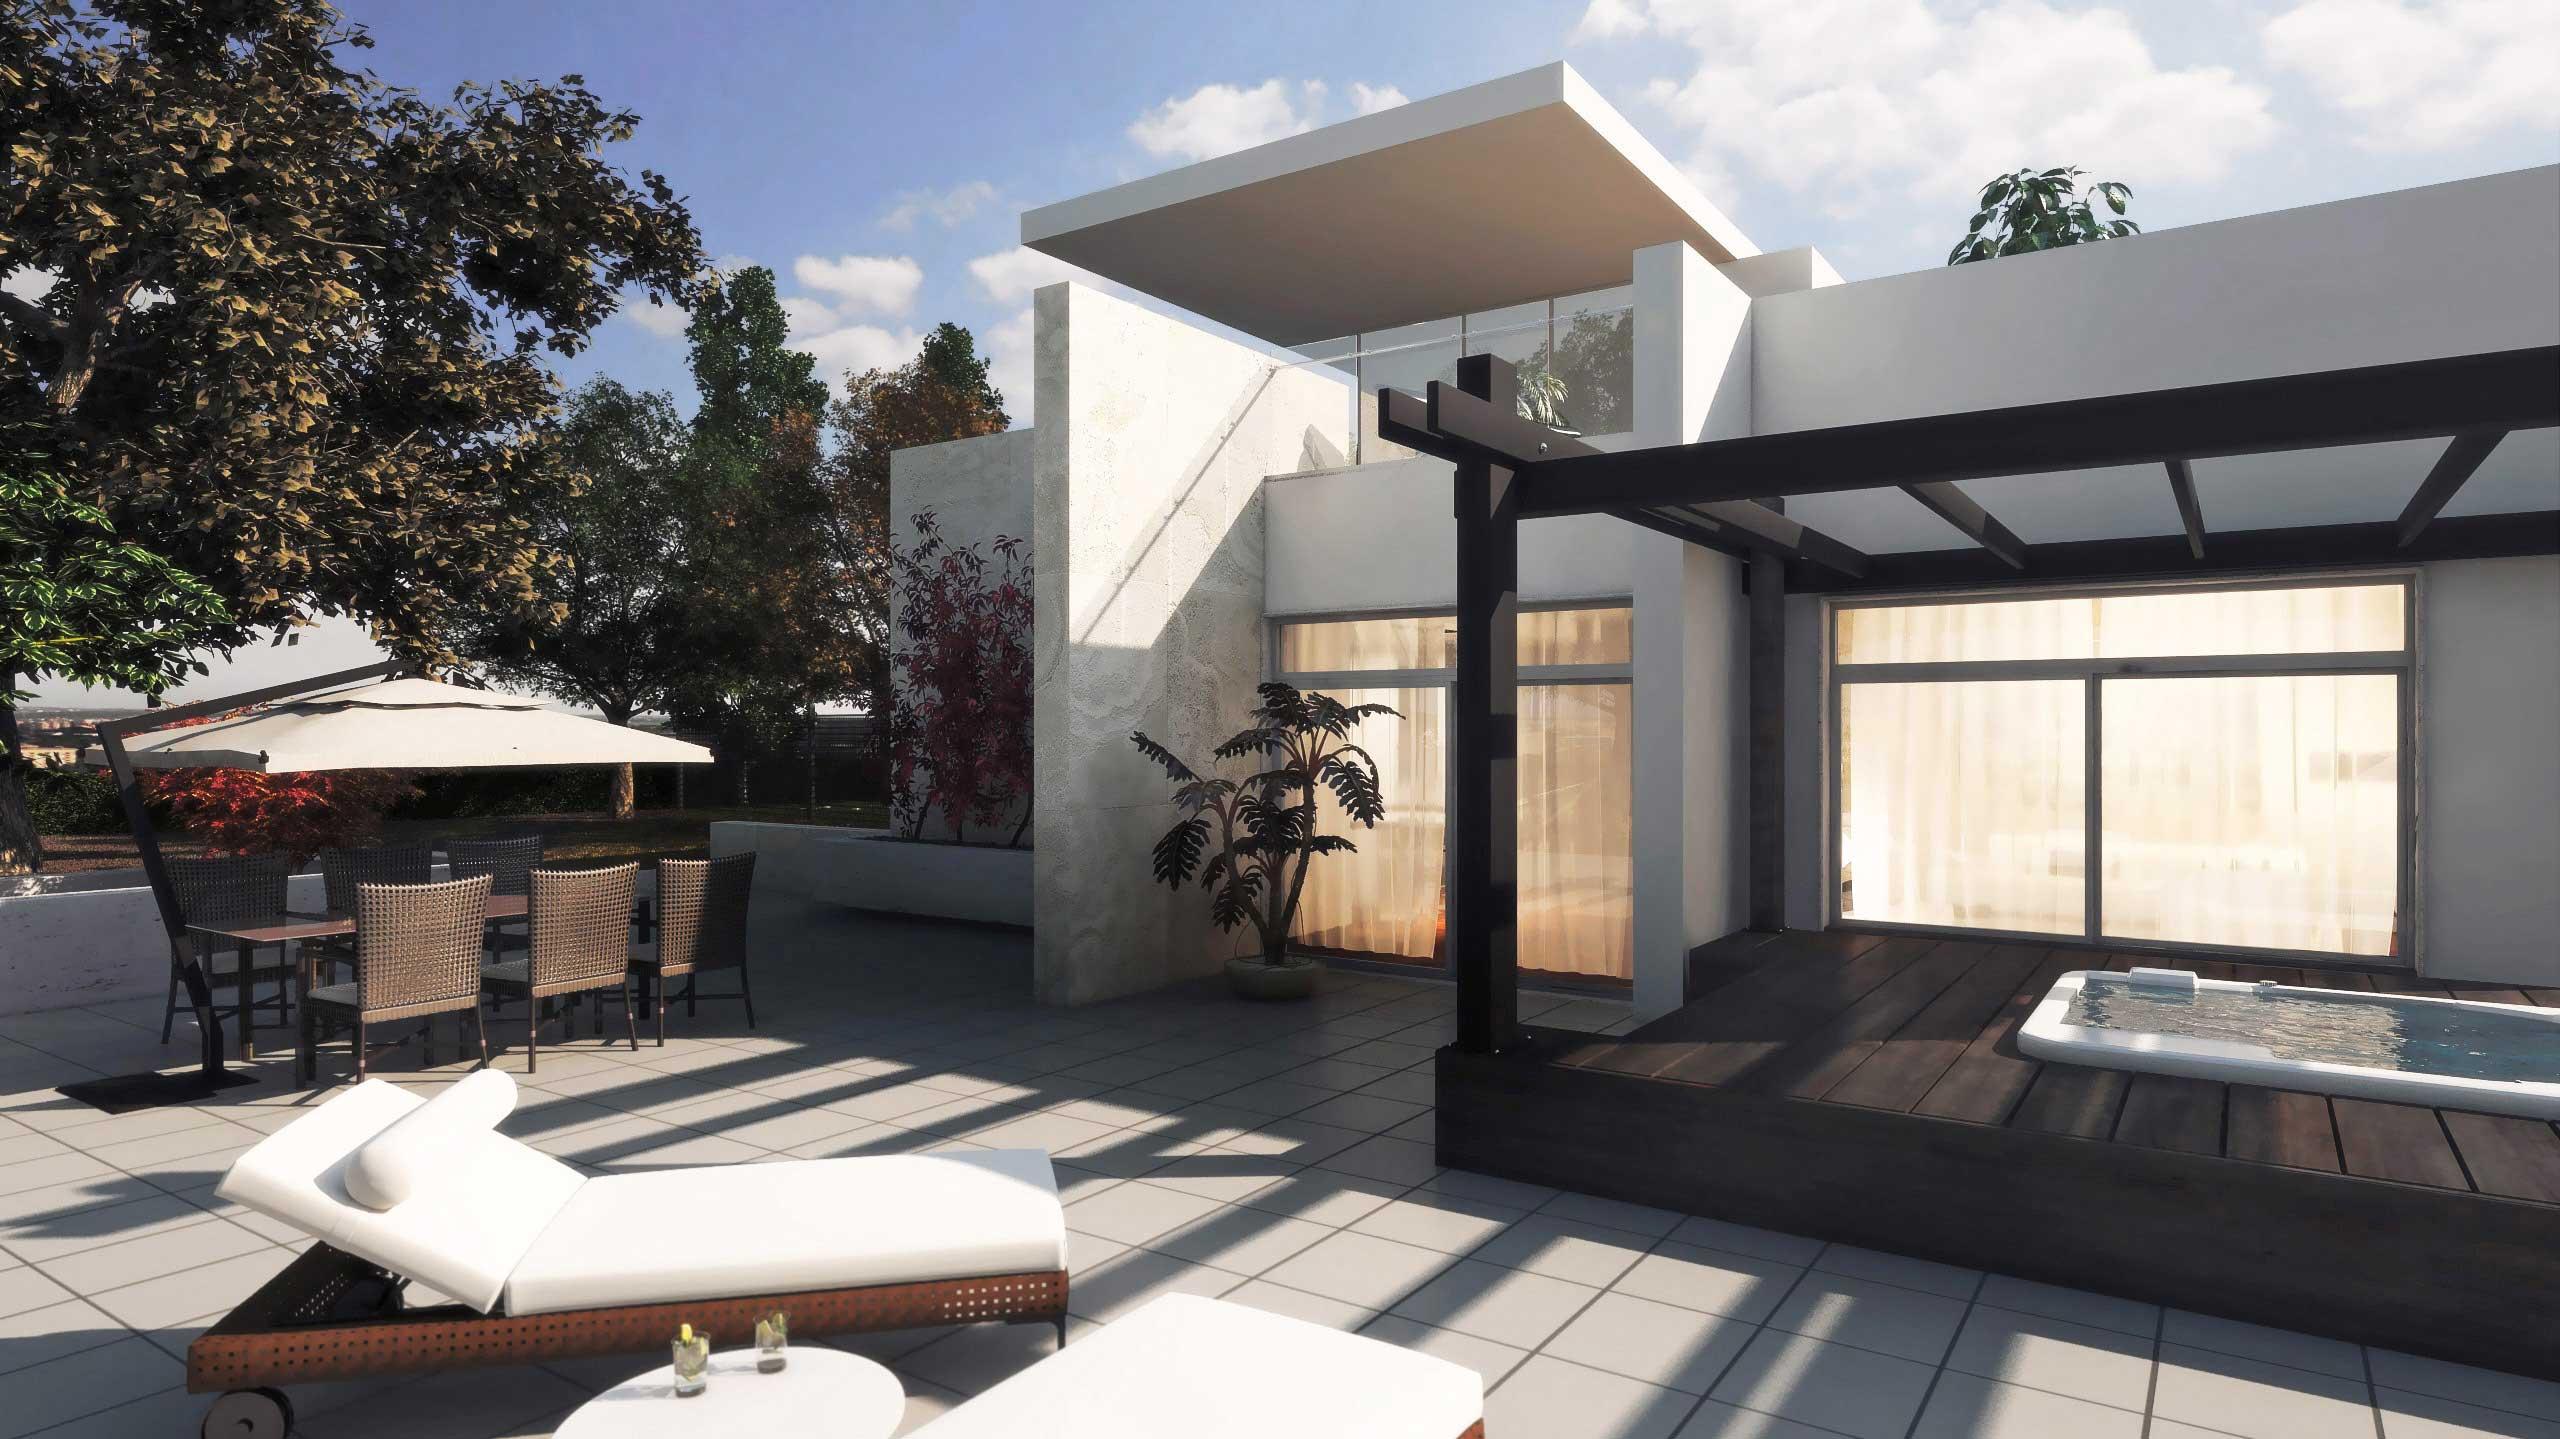 2012-Parsitalia-Belvedere-Eur-hight-00004_1300x731